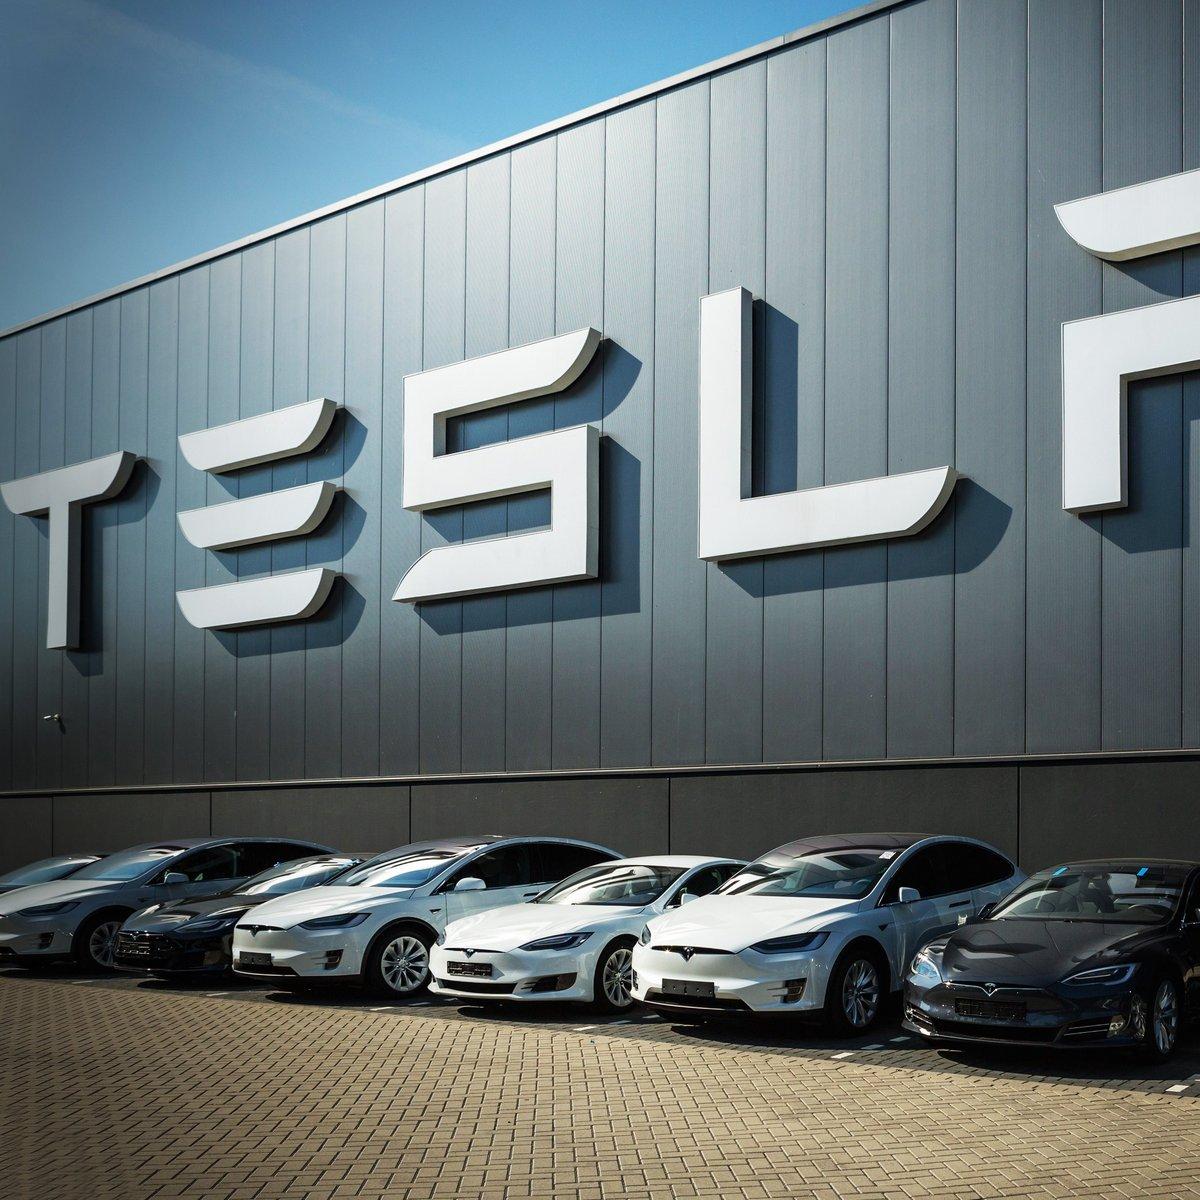 Tesla_cropped_2666x2667_cropped_0x0_cropped_0x0